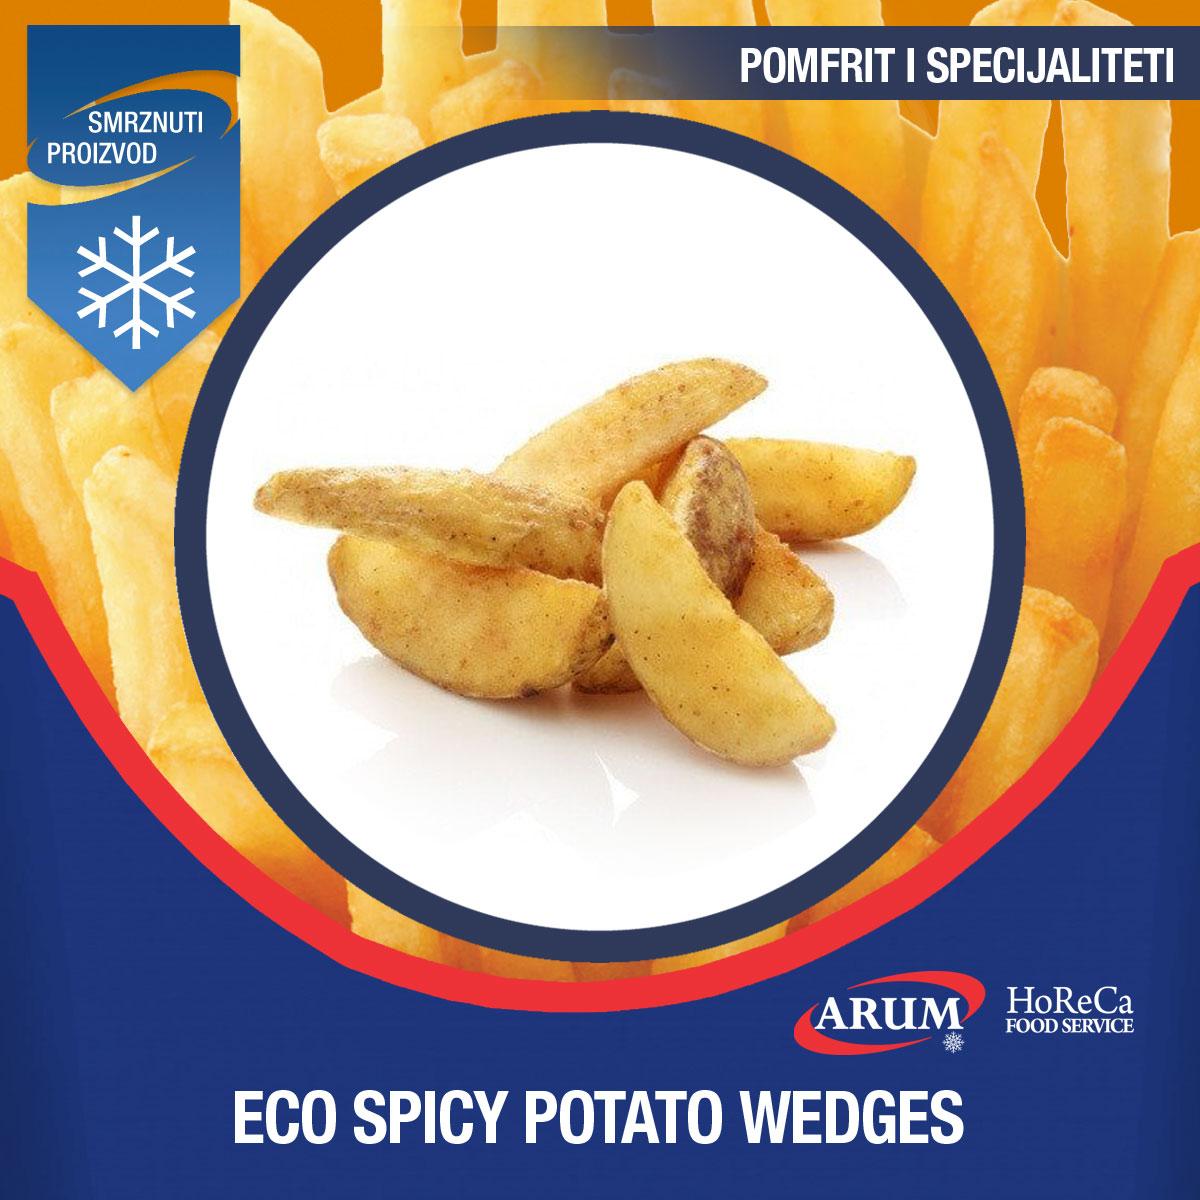 Eco spicy potato wedges 4x2.5 kg